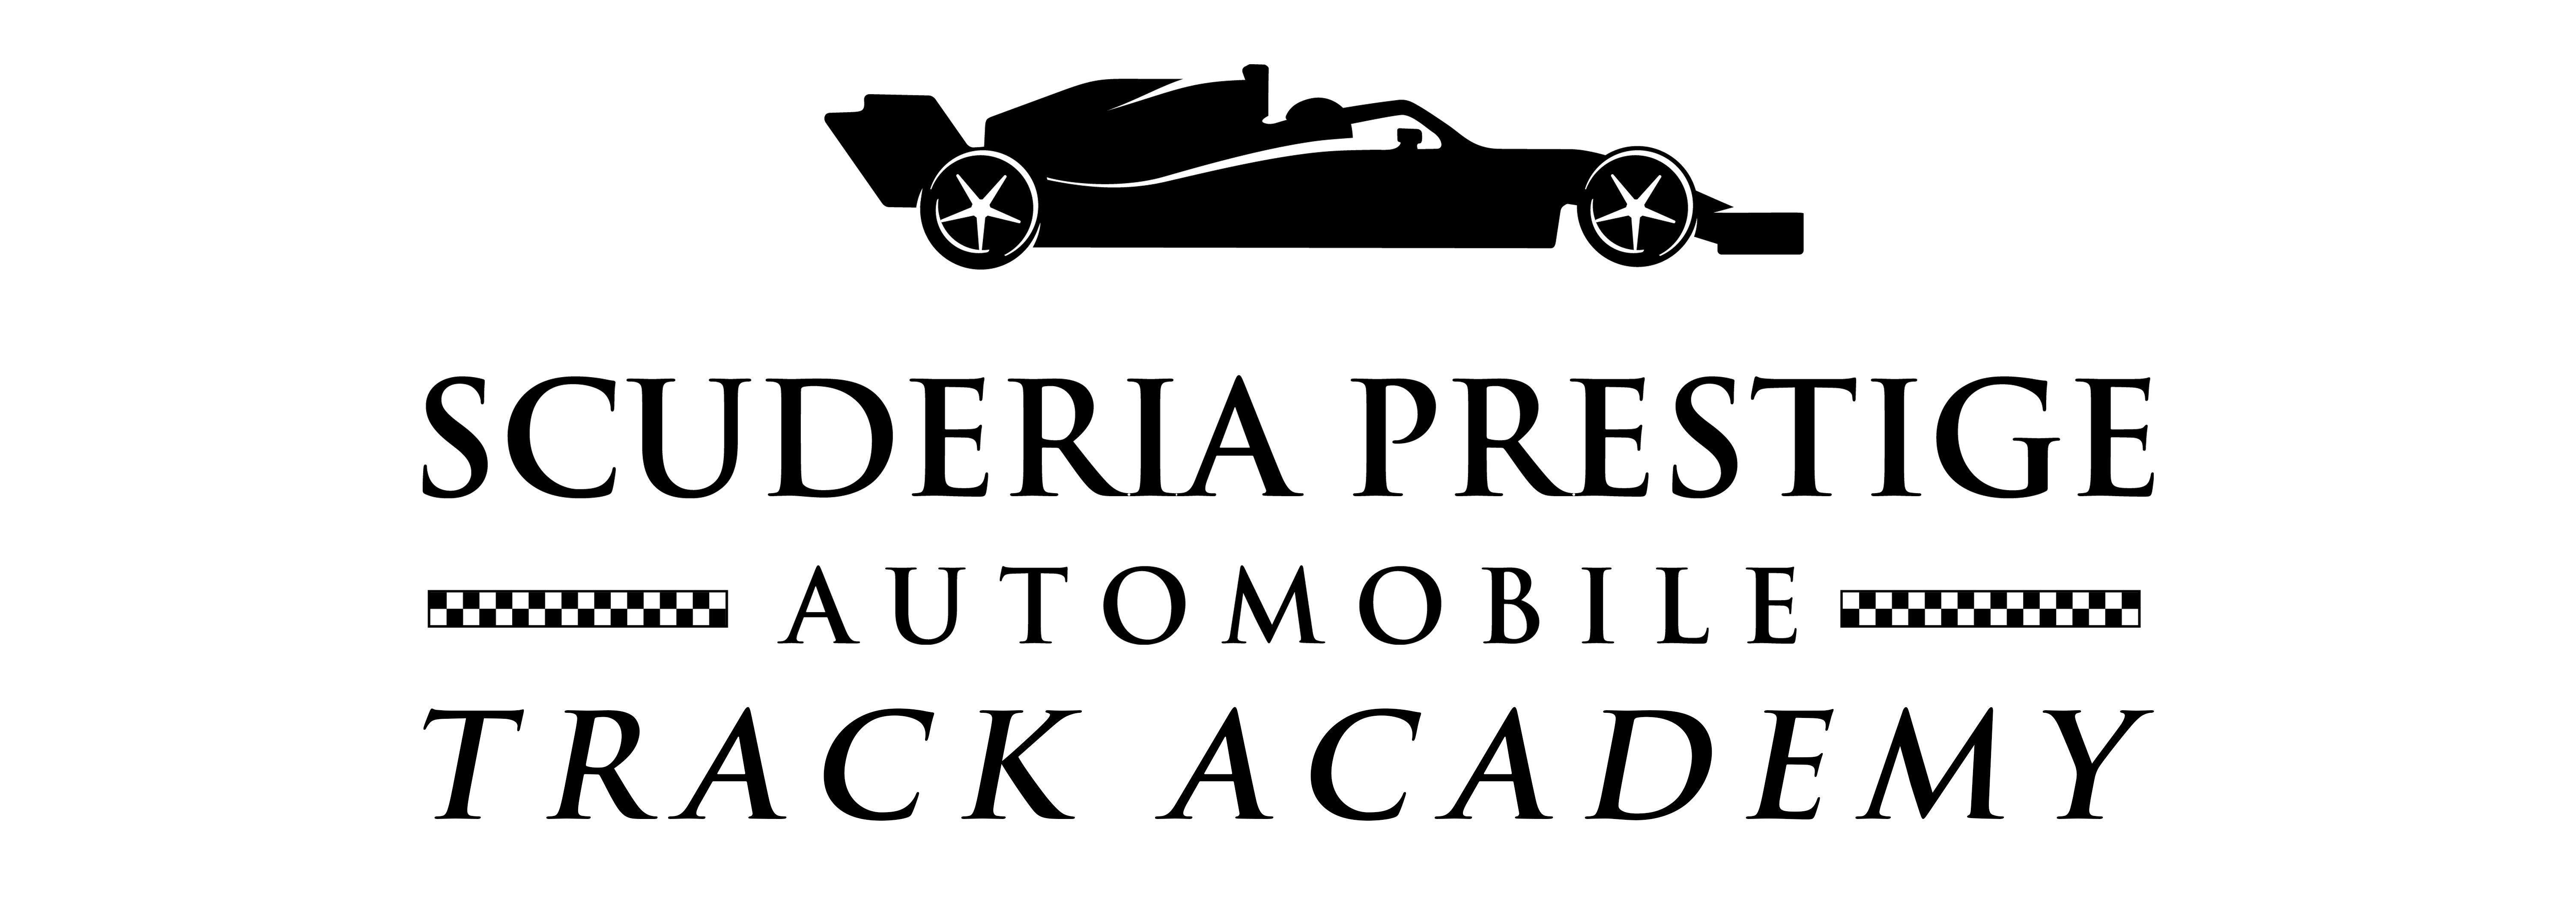 Webite Logo - Scuderia Prestige